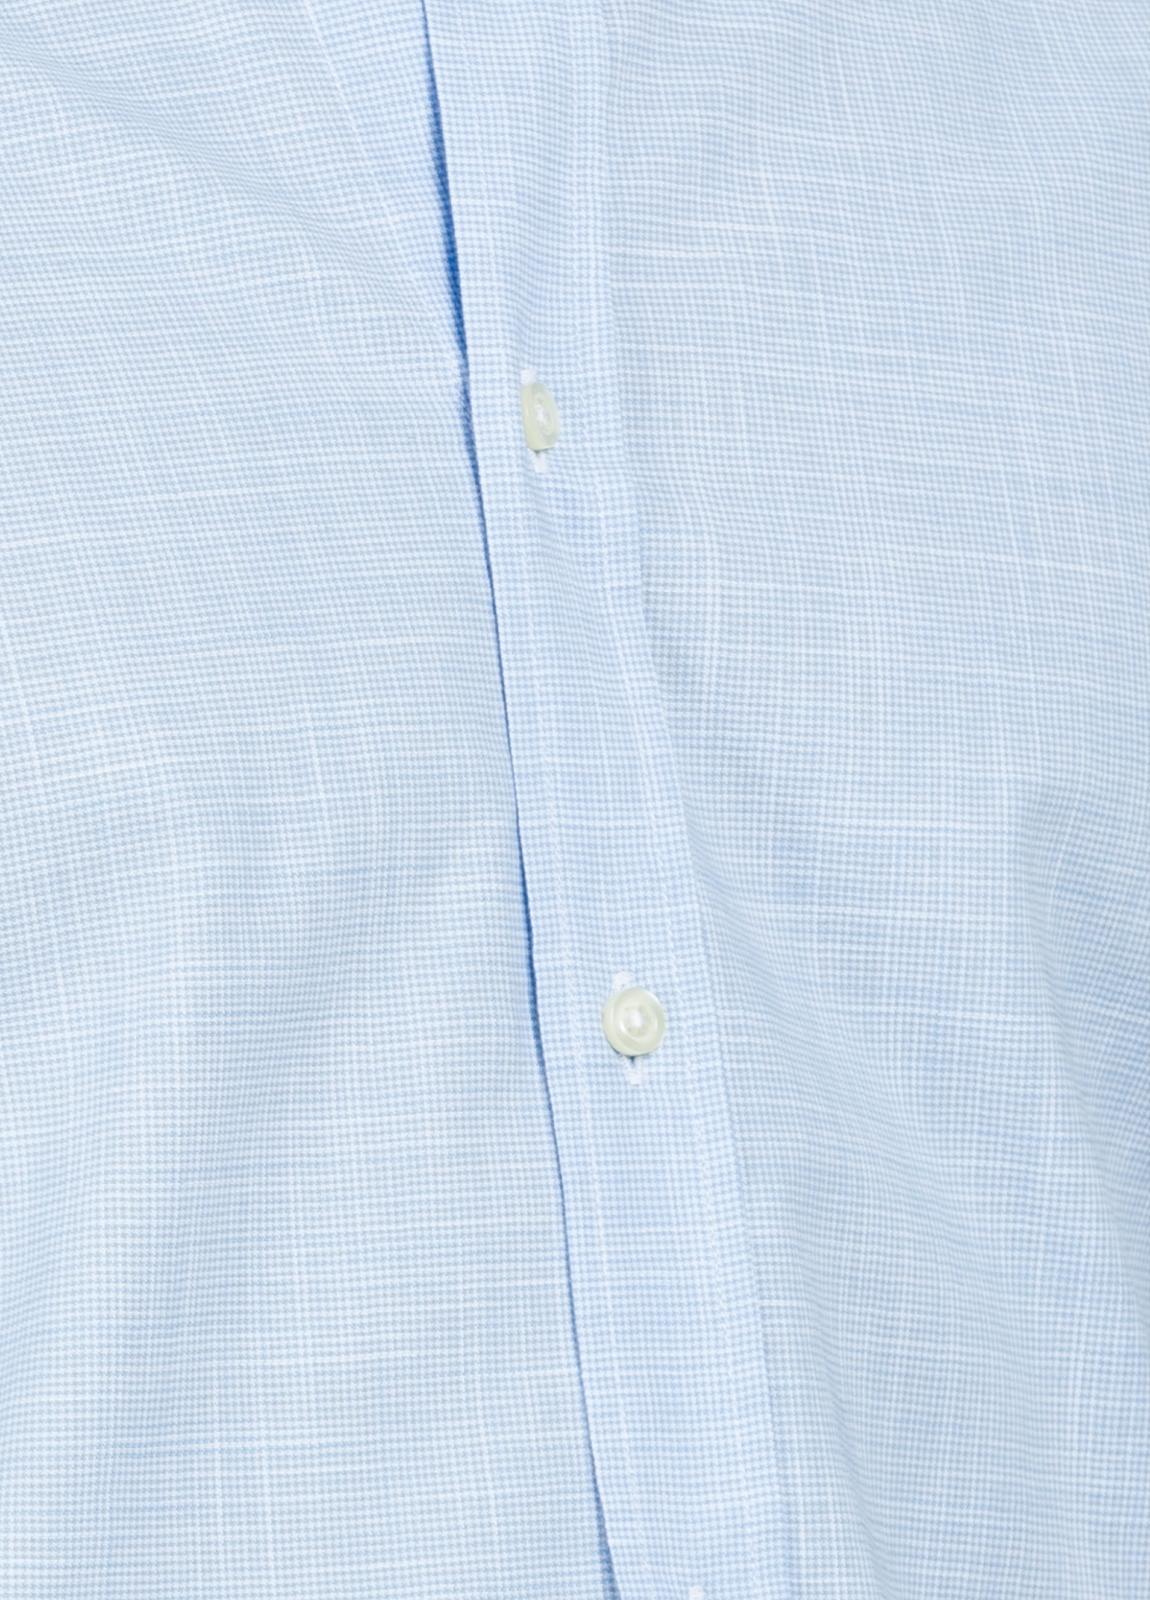 Camisa Casual Wear SLIM FIT Modelo BUTTON DOWN dibujo pata de gallo color celeste, 100% Algodón. - Ítem2